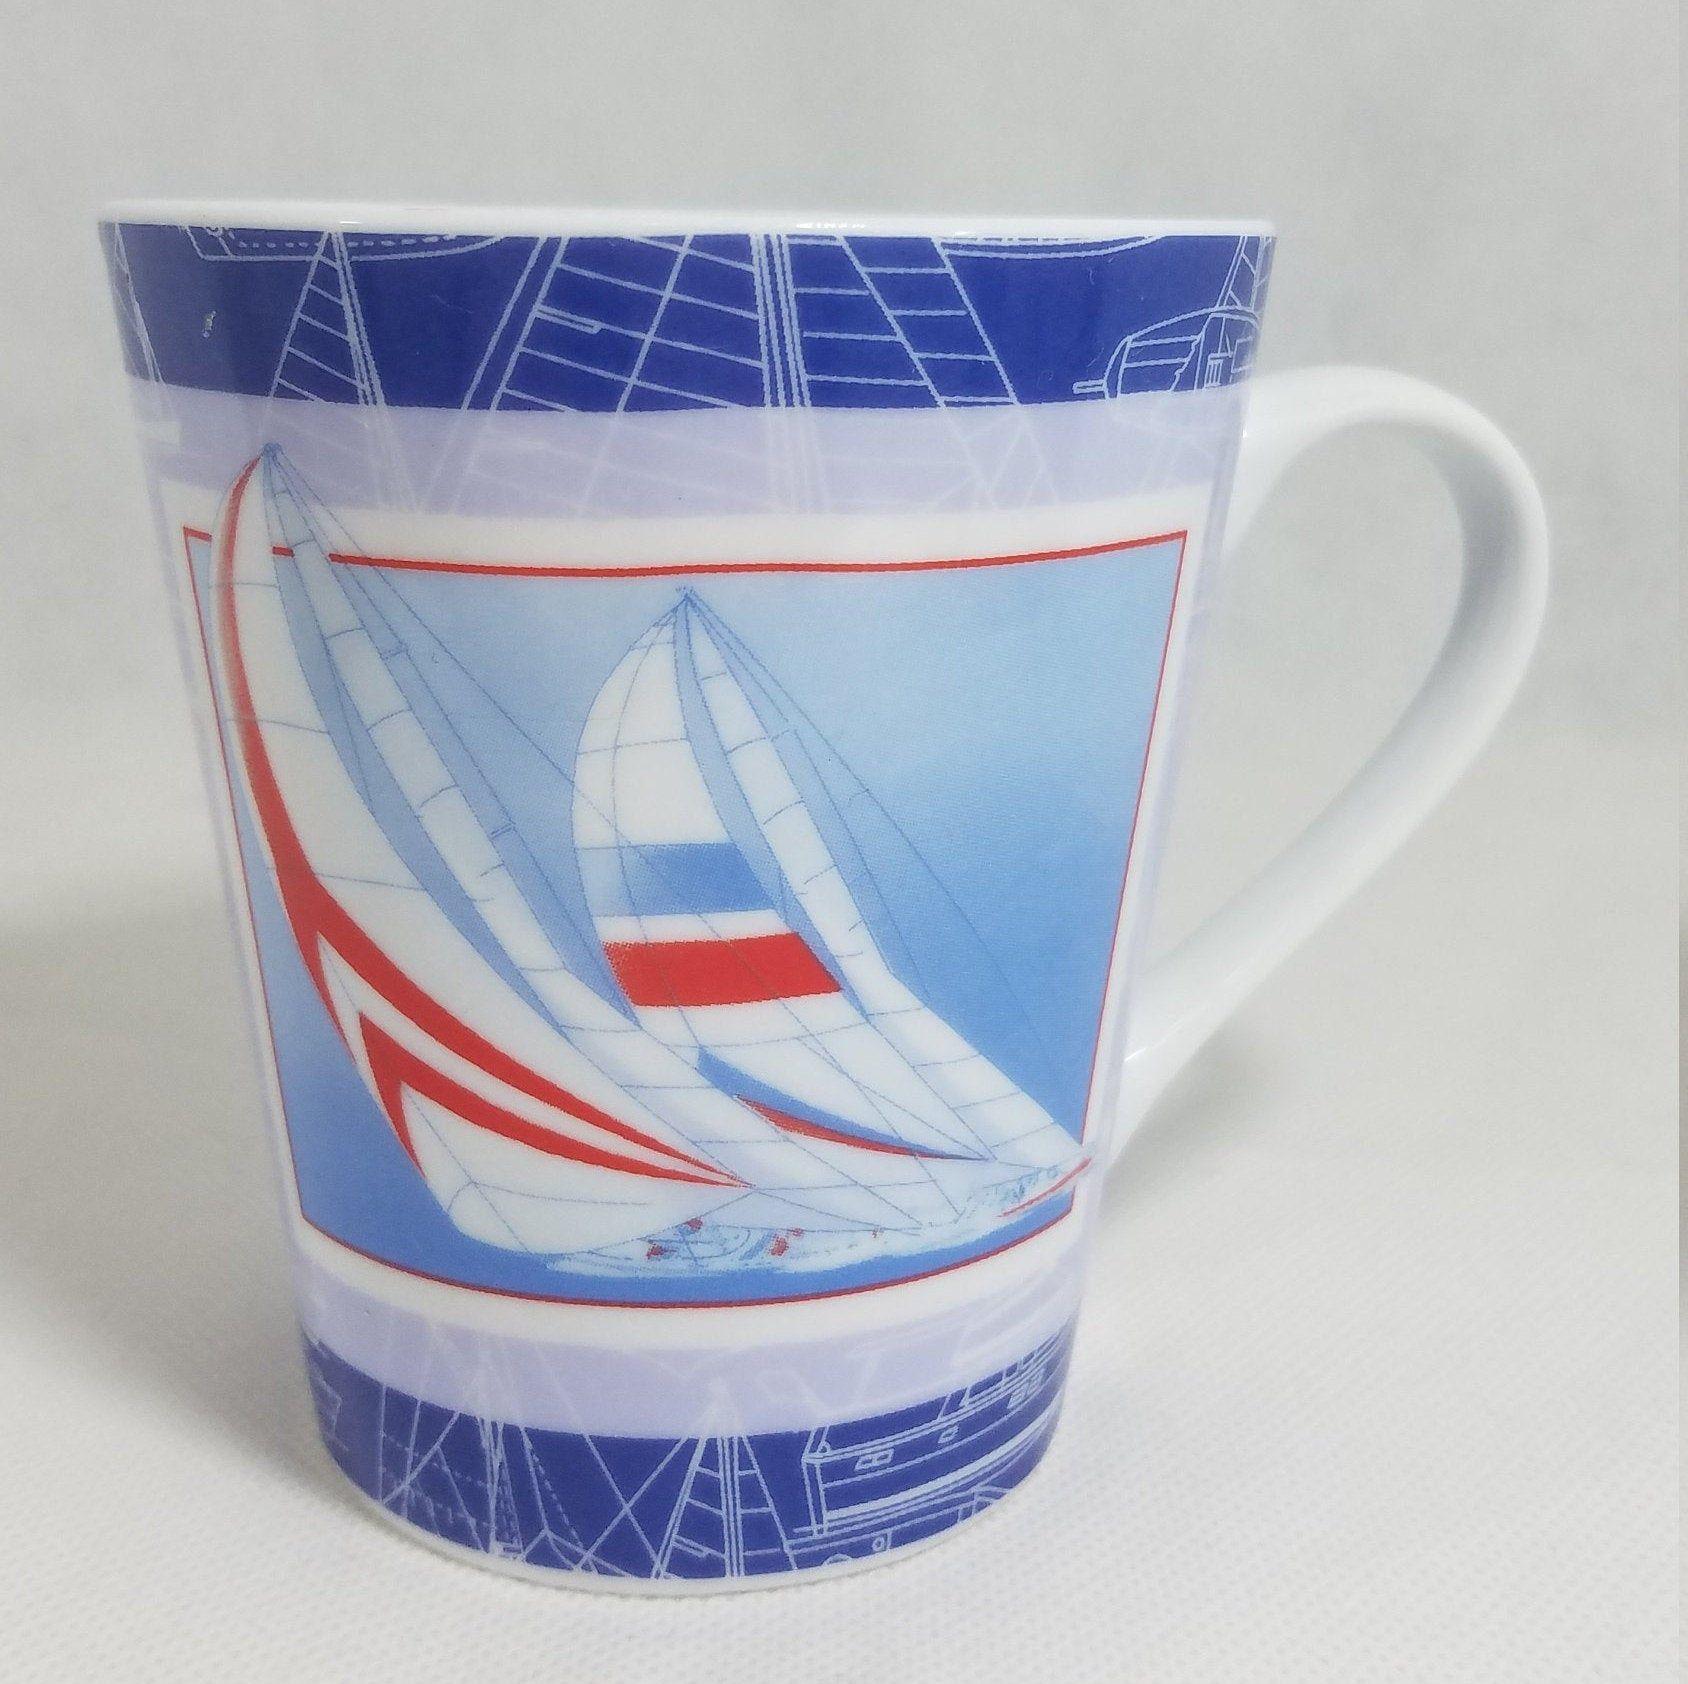 Nautical mug boat mugocean mugvintage sailboat nautical